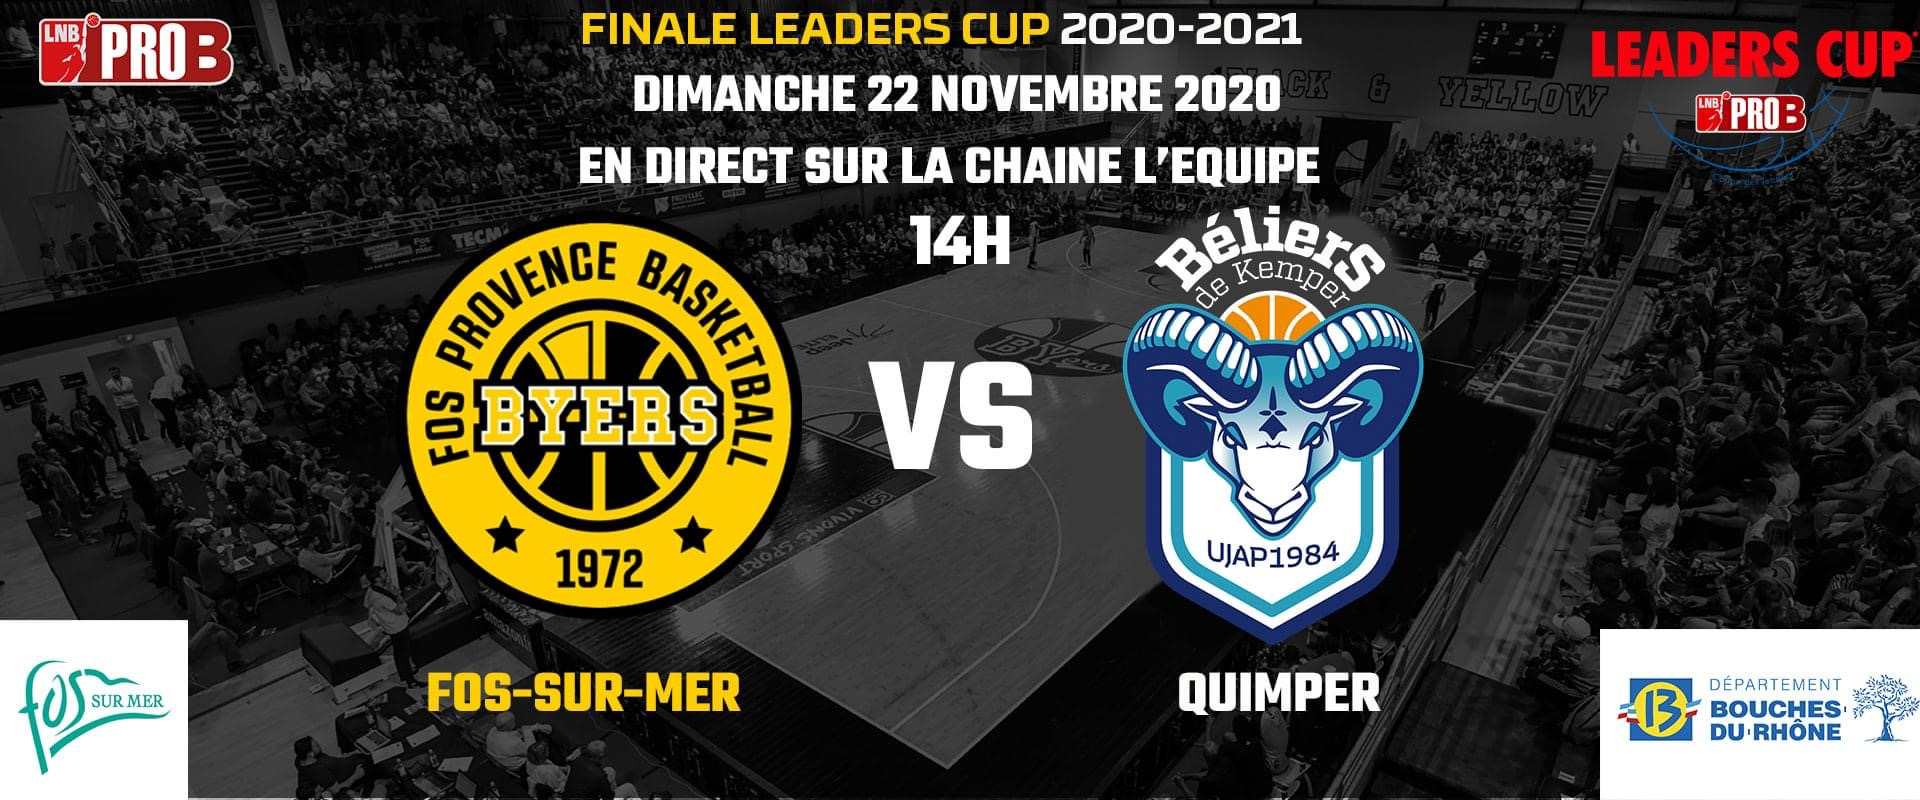 201120-Basket.jpg (354 KB)